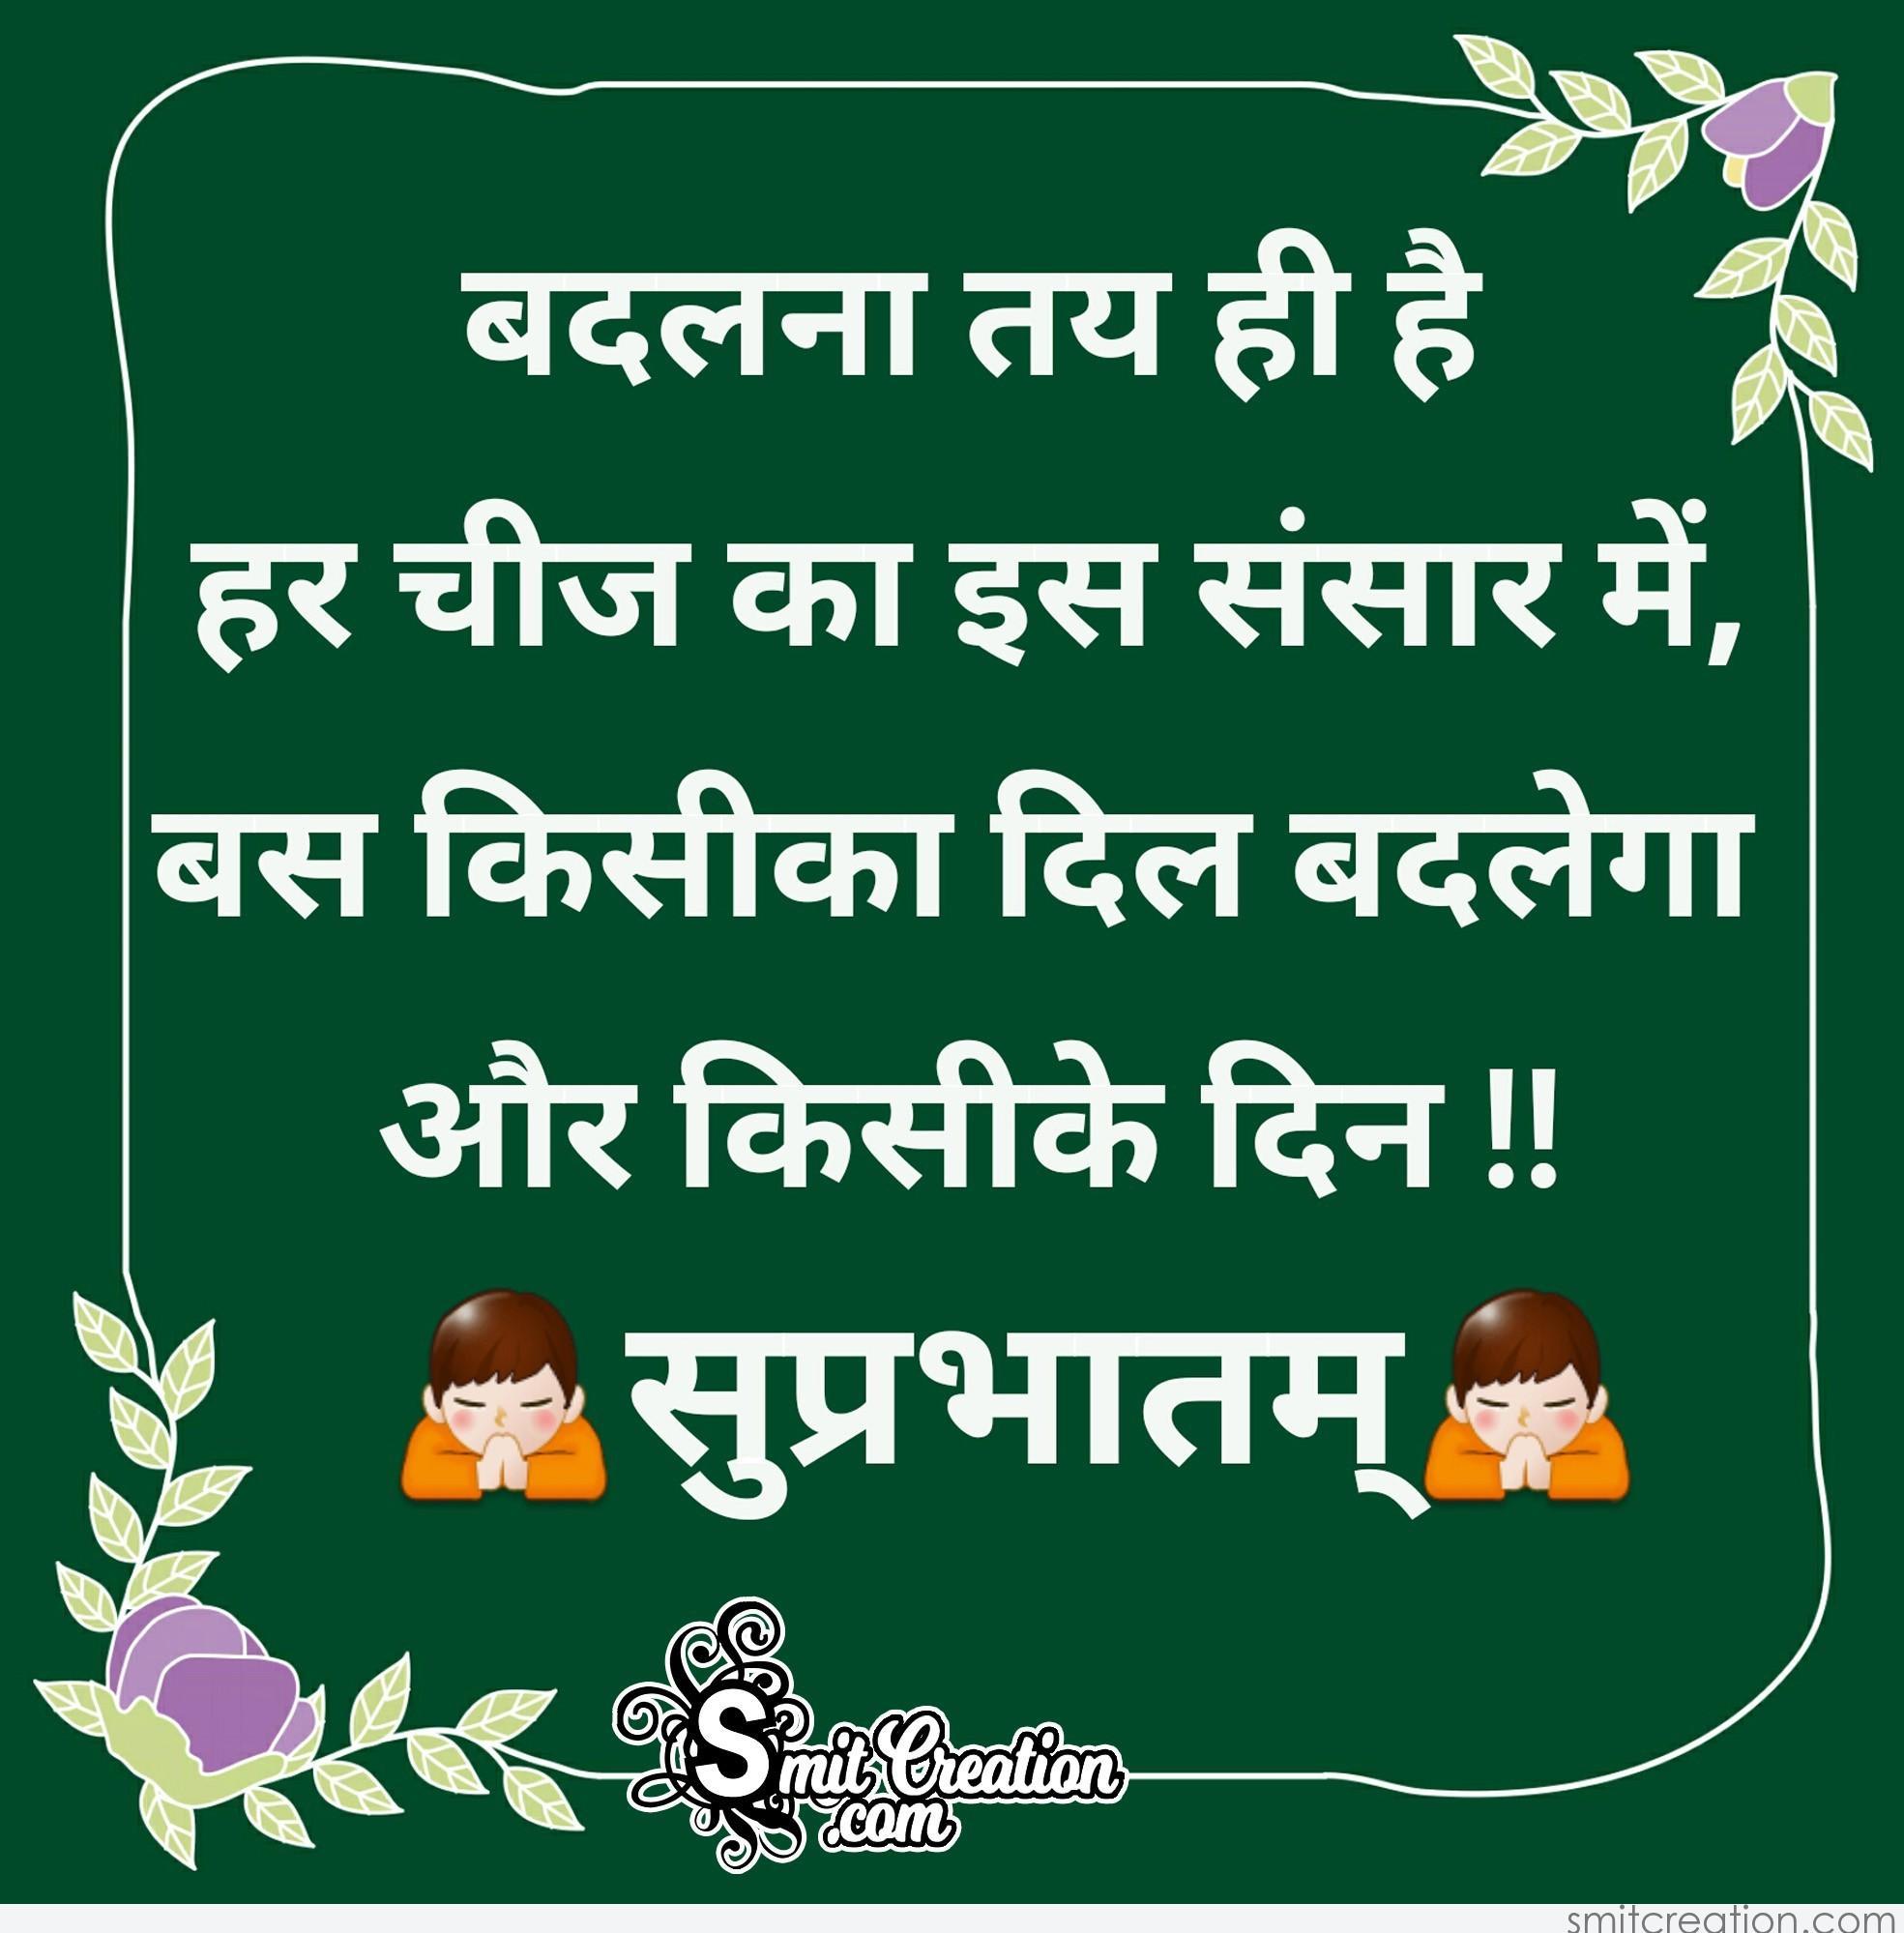 Hindi Suprabhat Message हद सपरभत सदश